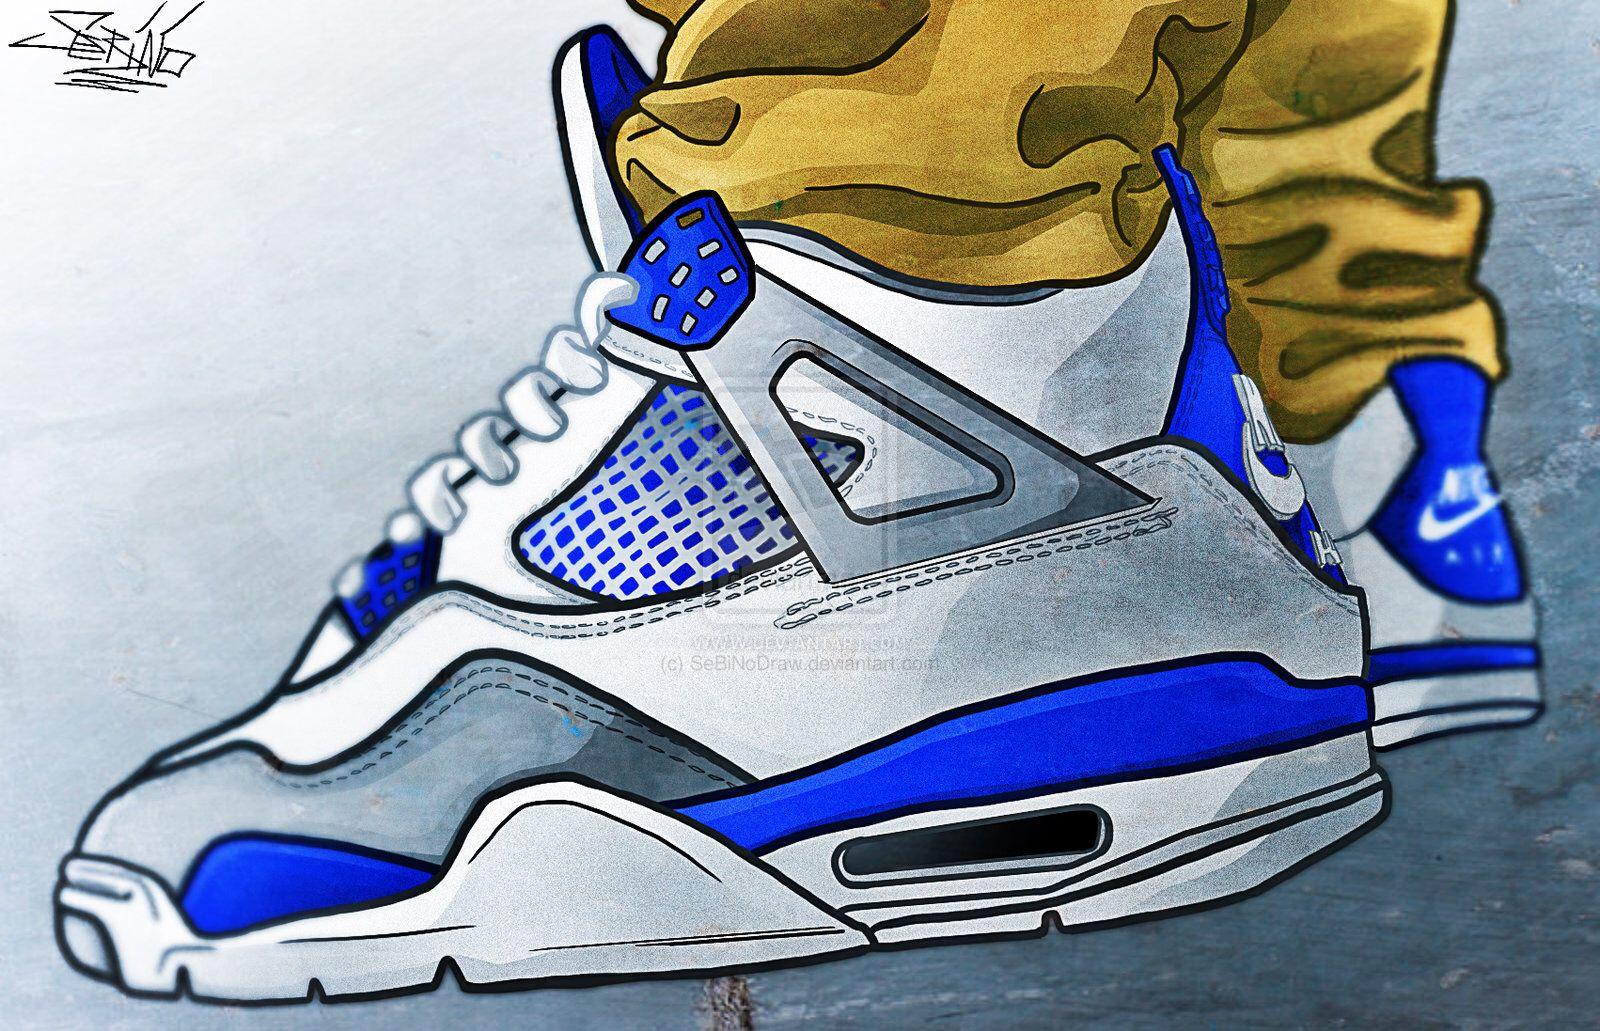 Pin on Sneakers & streetwear